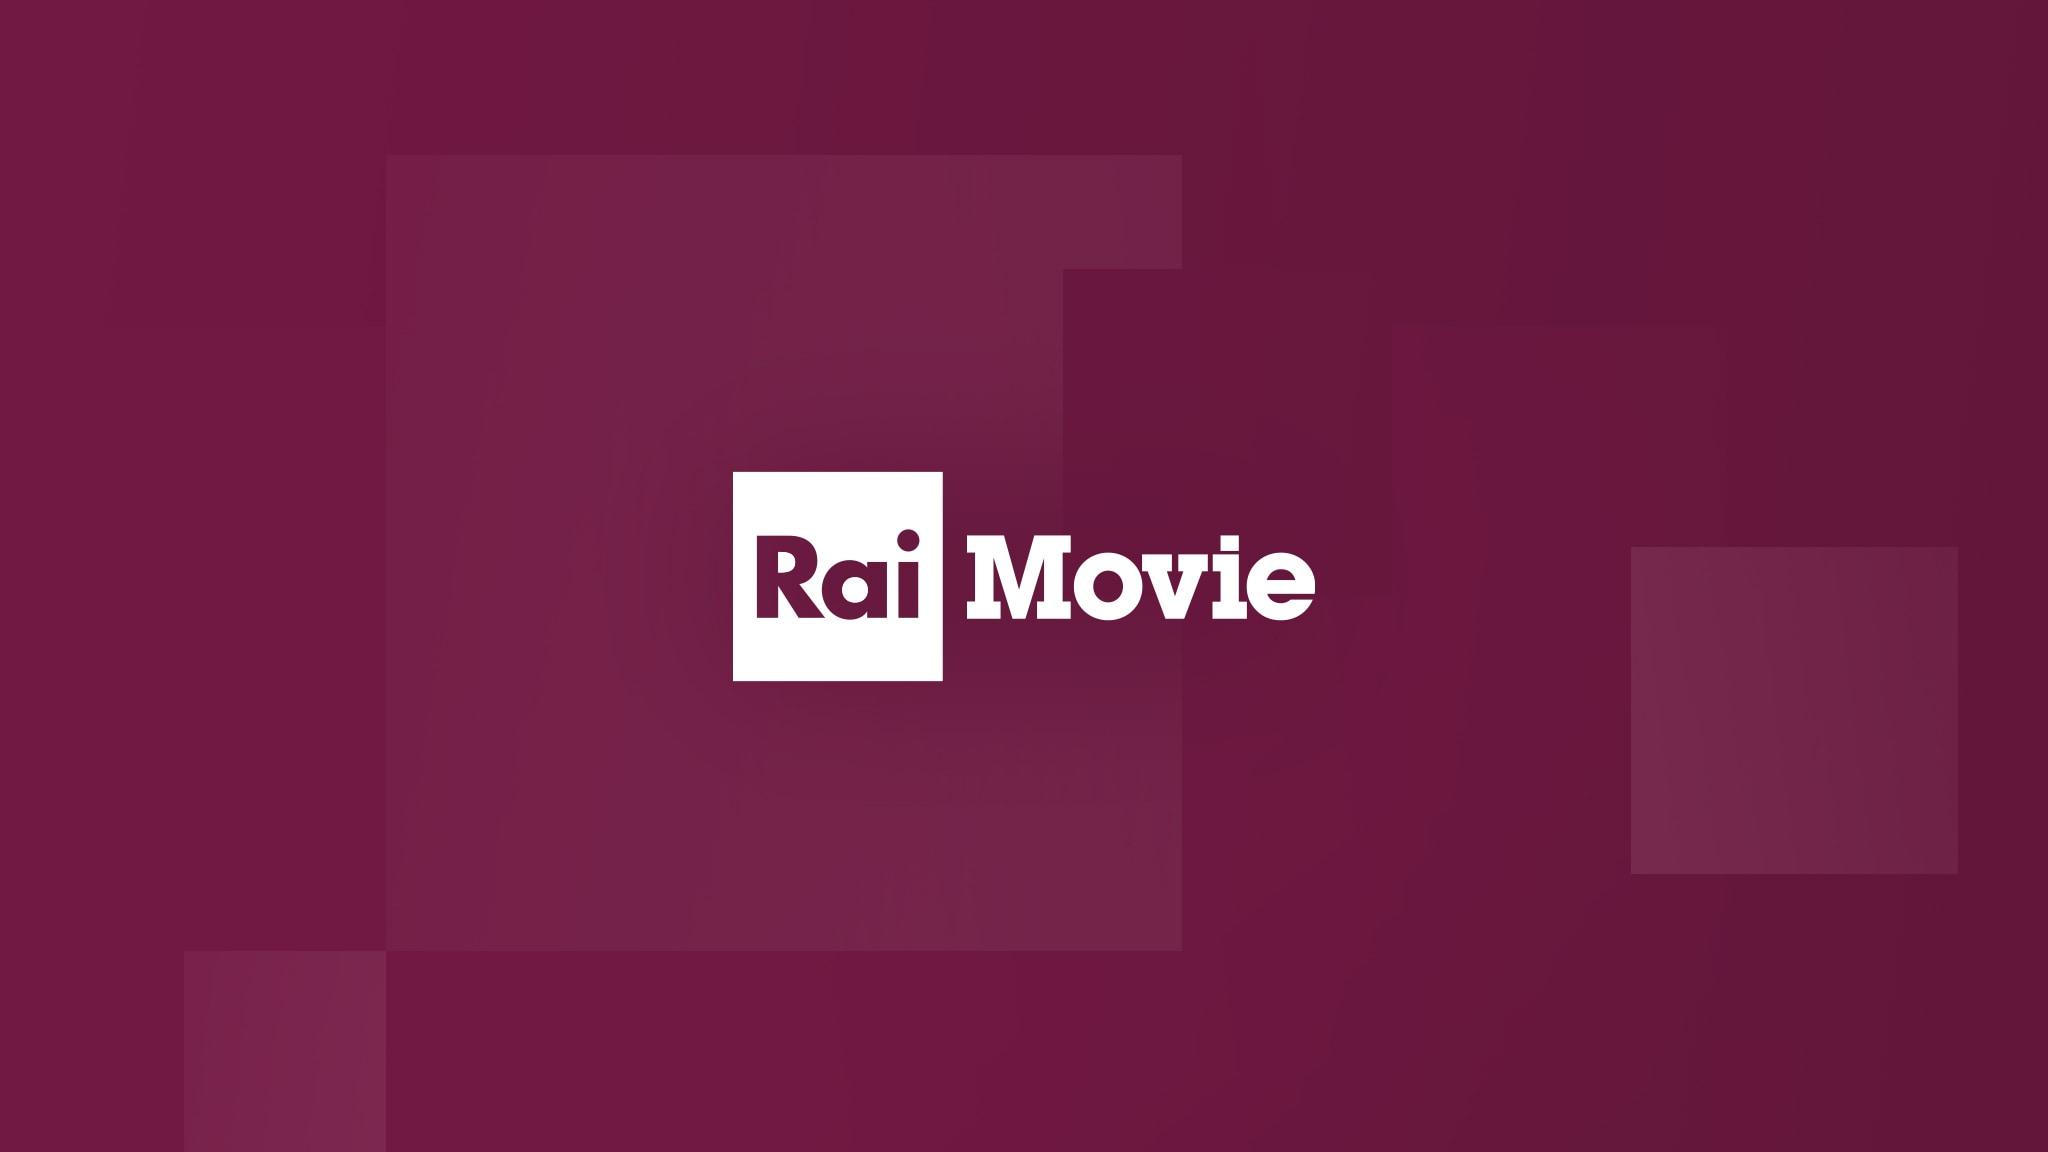 Rai Movie Gente d'onore